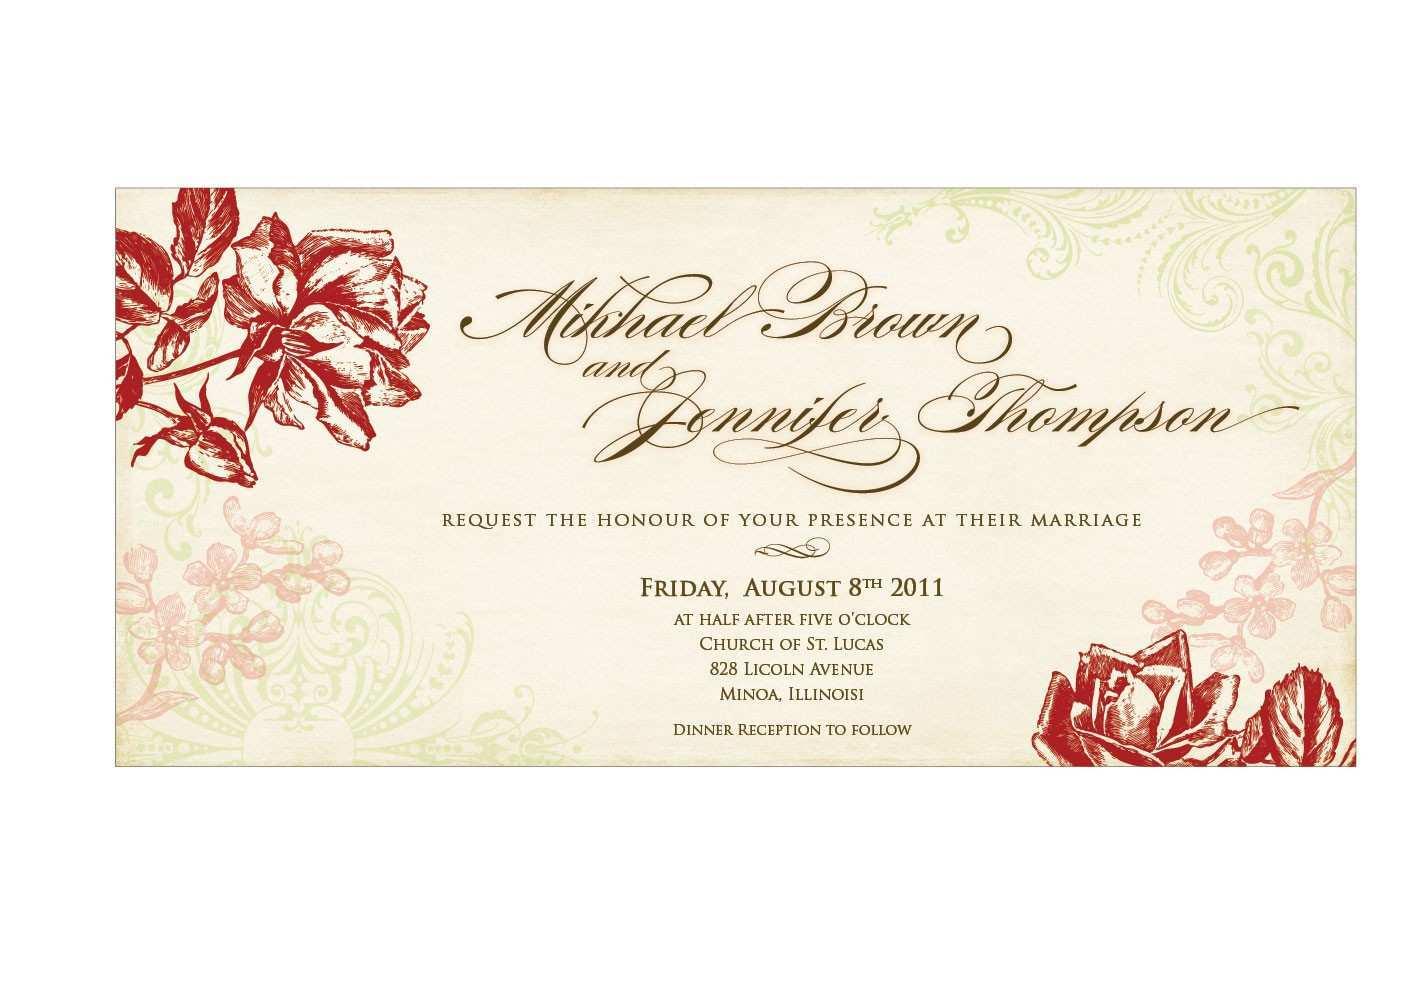 21 Visiting Blank Wedding Invitation Templates Hd in Photoshop for Blank Wedding Invitation Templates Hd